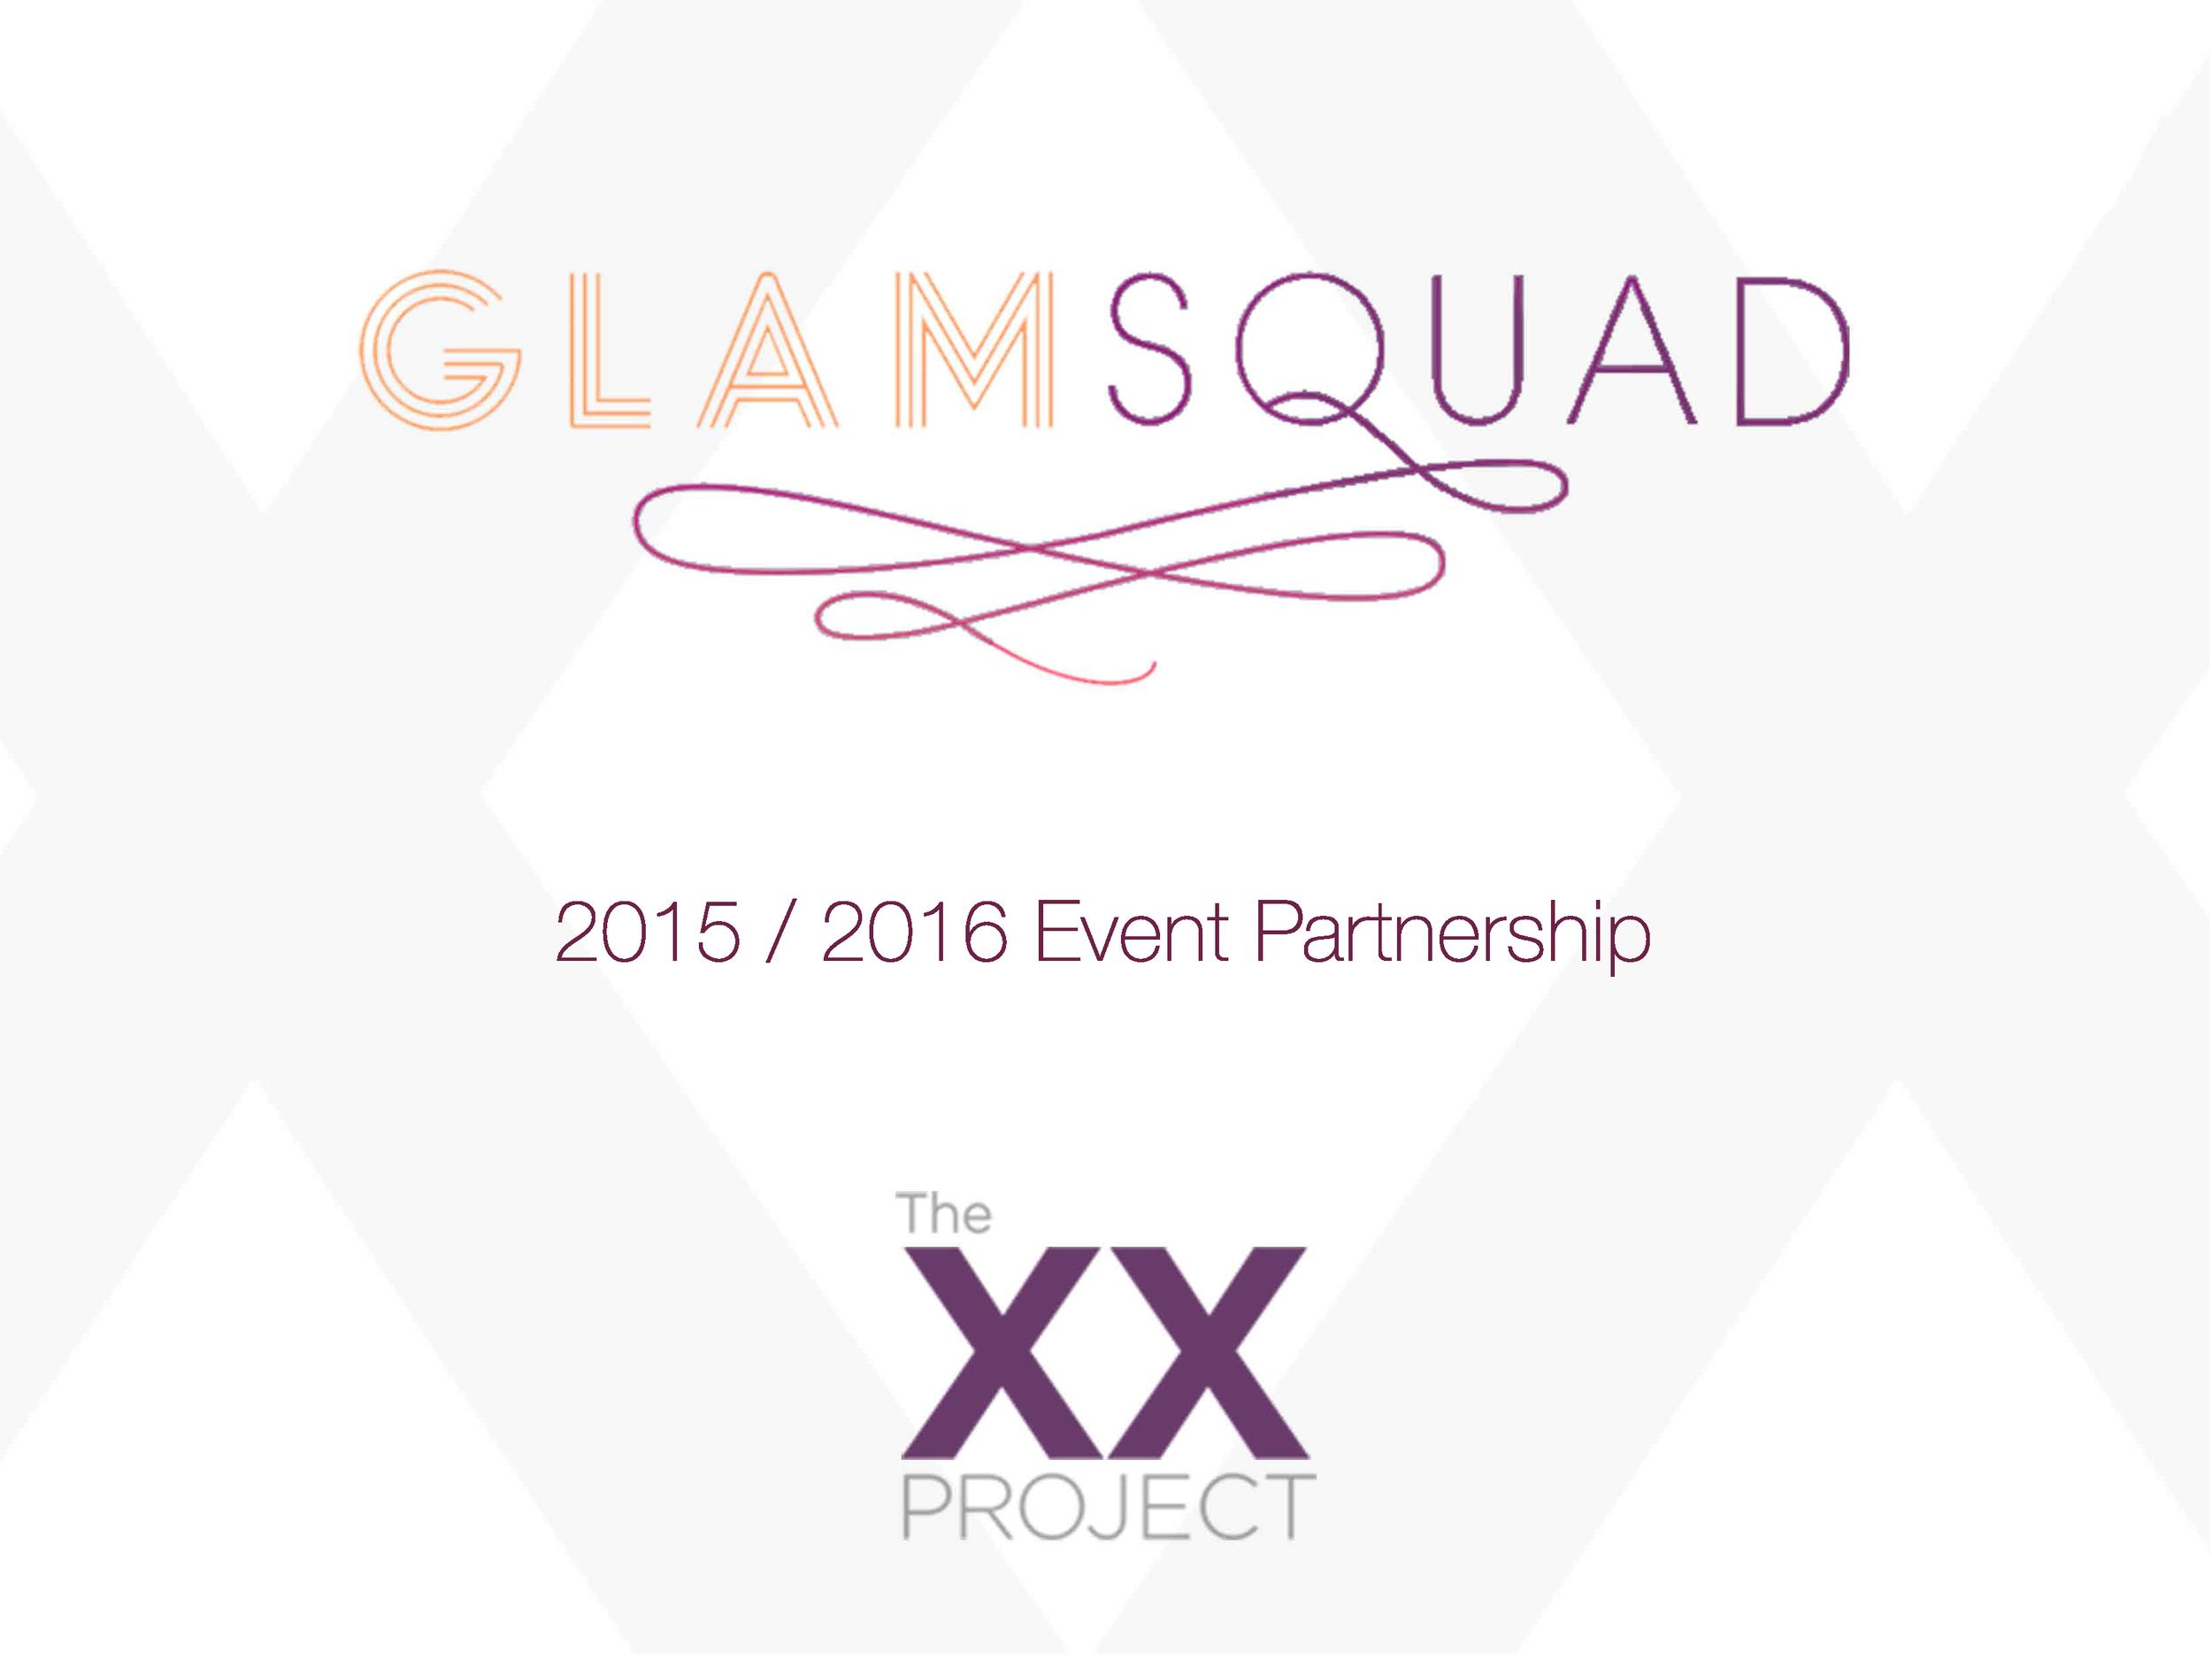 Glamsquad Partnership